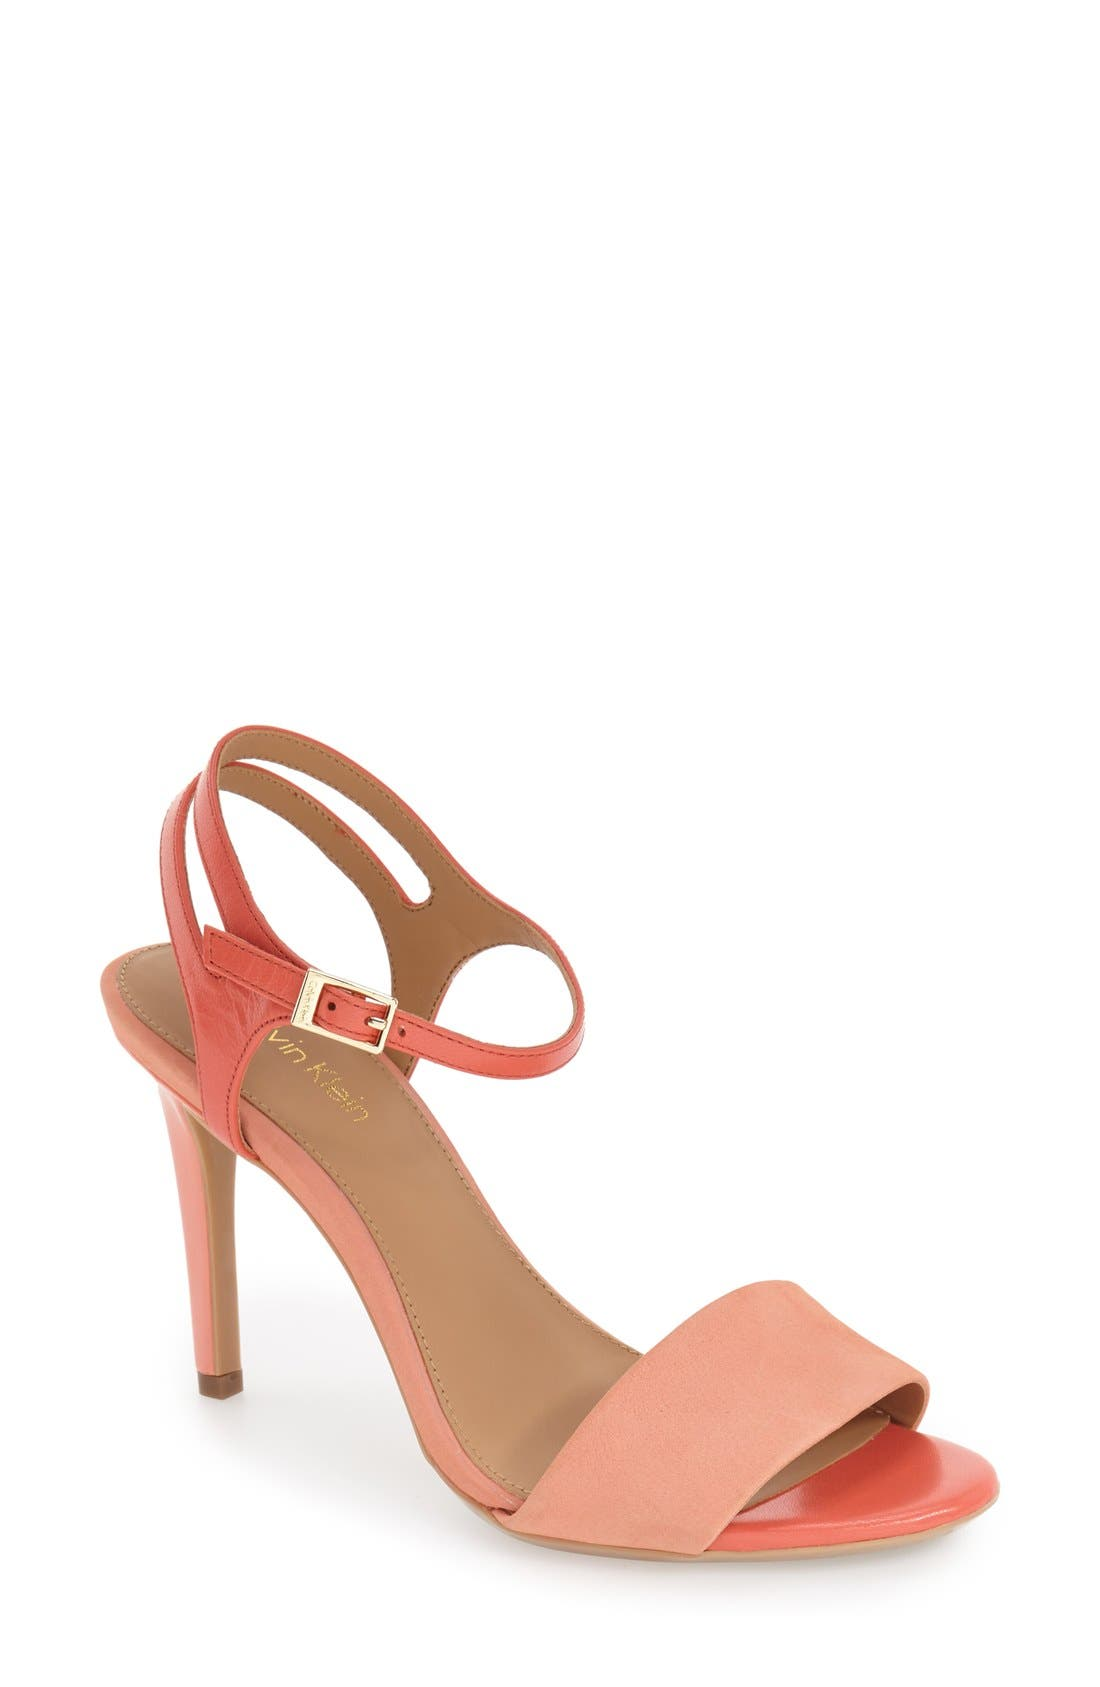 'Nadina' Ankle Strap Sandal,                             Main thumbnail 1, color,                             Salmon/ Deep Coral Leather